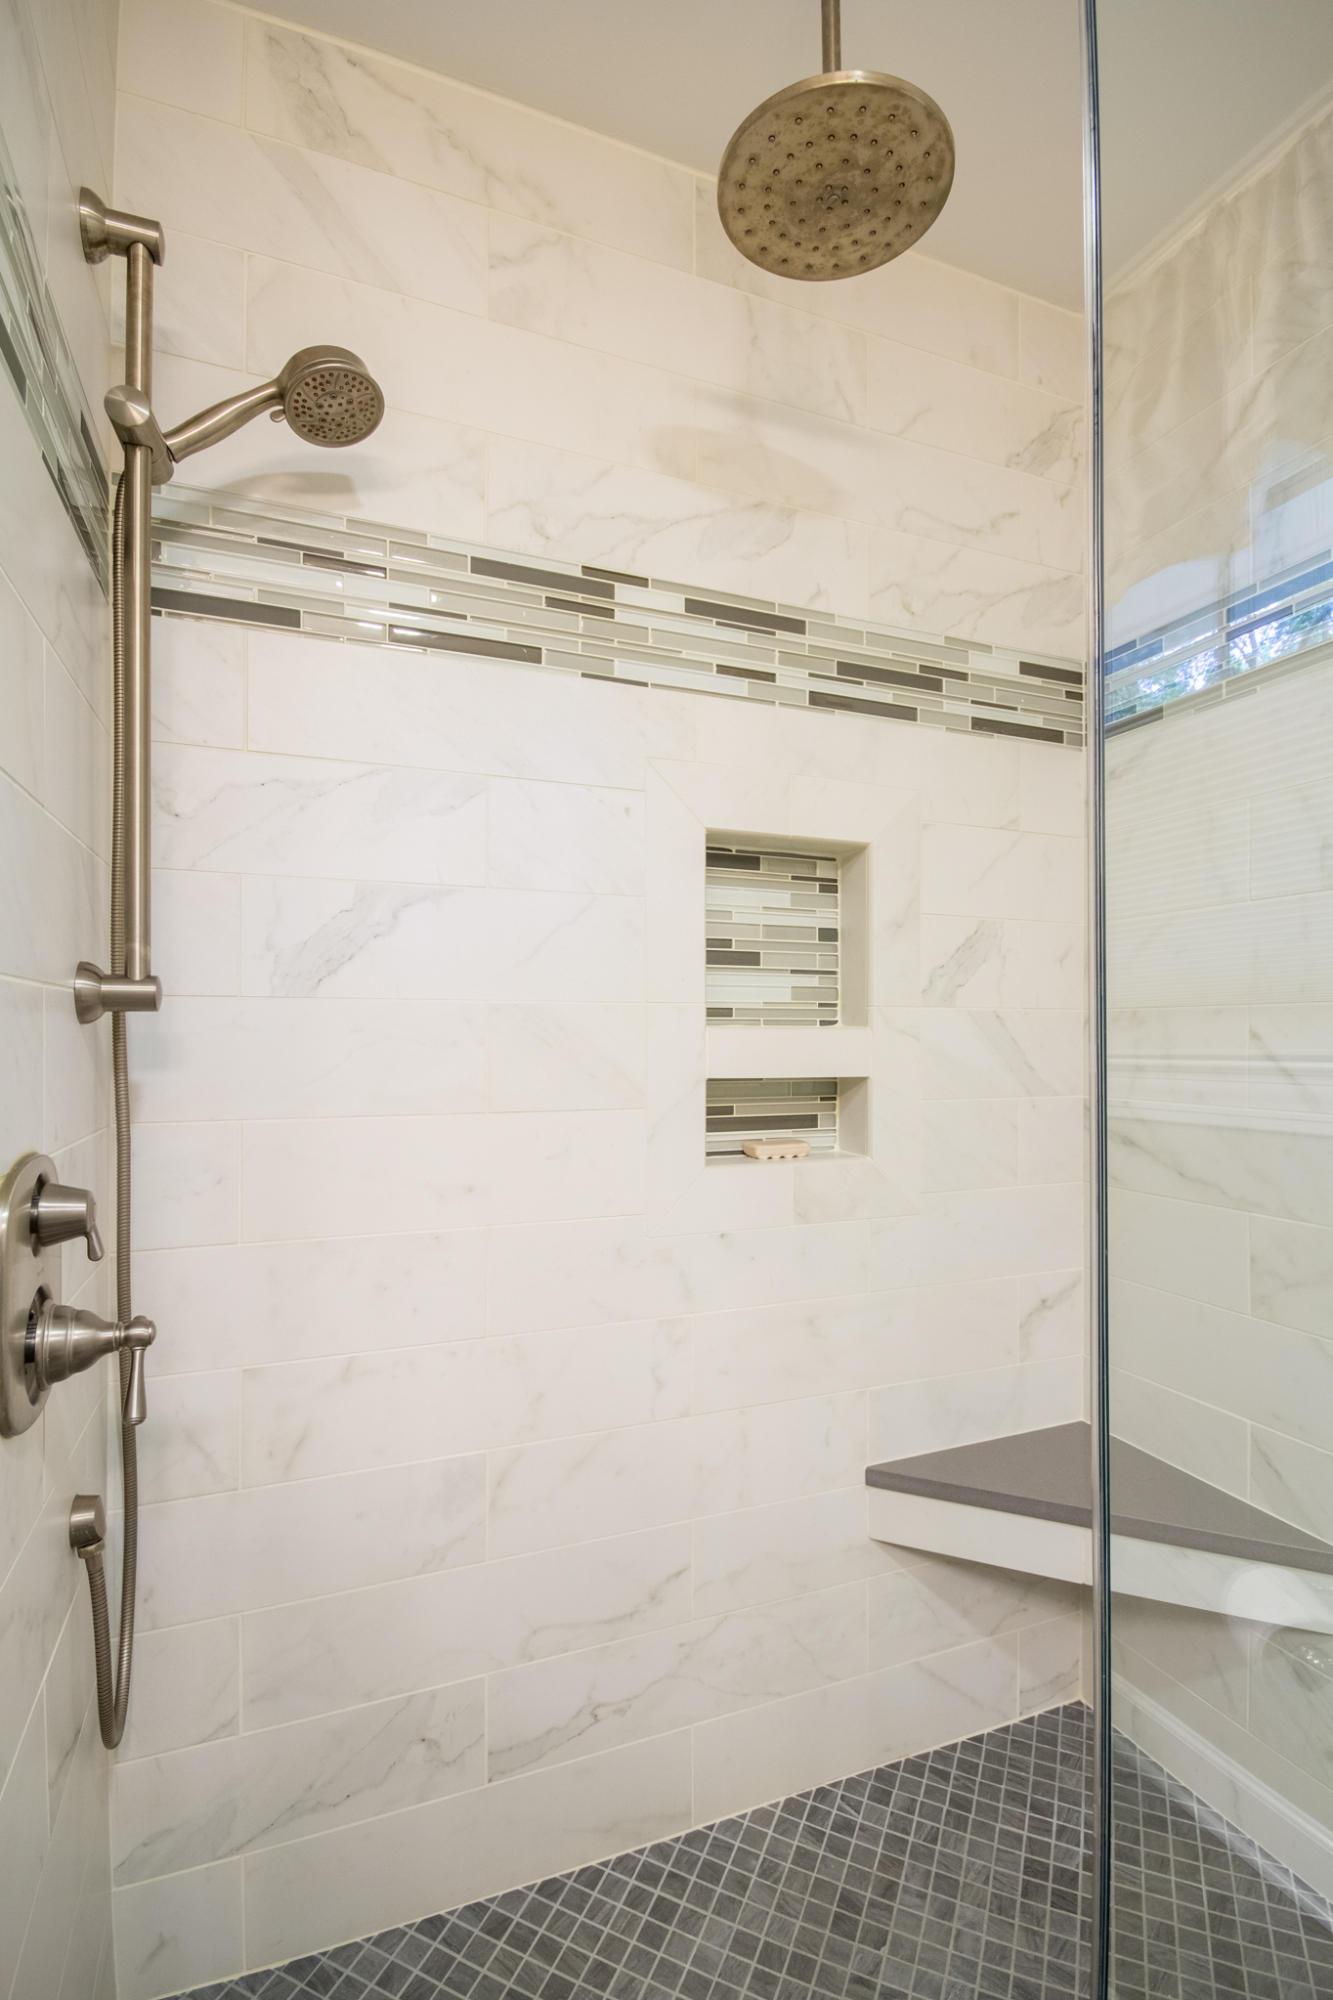 Belvedere Estates Homes For Sale - 6021 Rembert, Hanahan, SC - 4